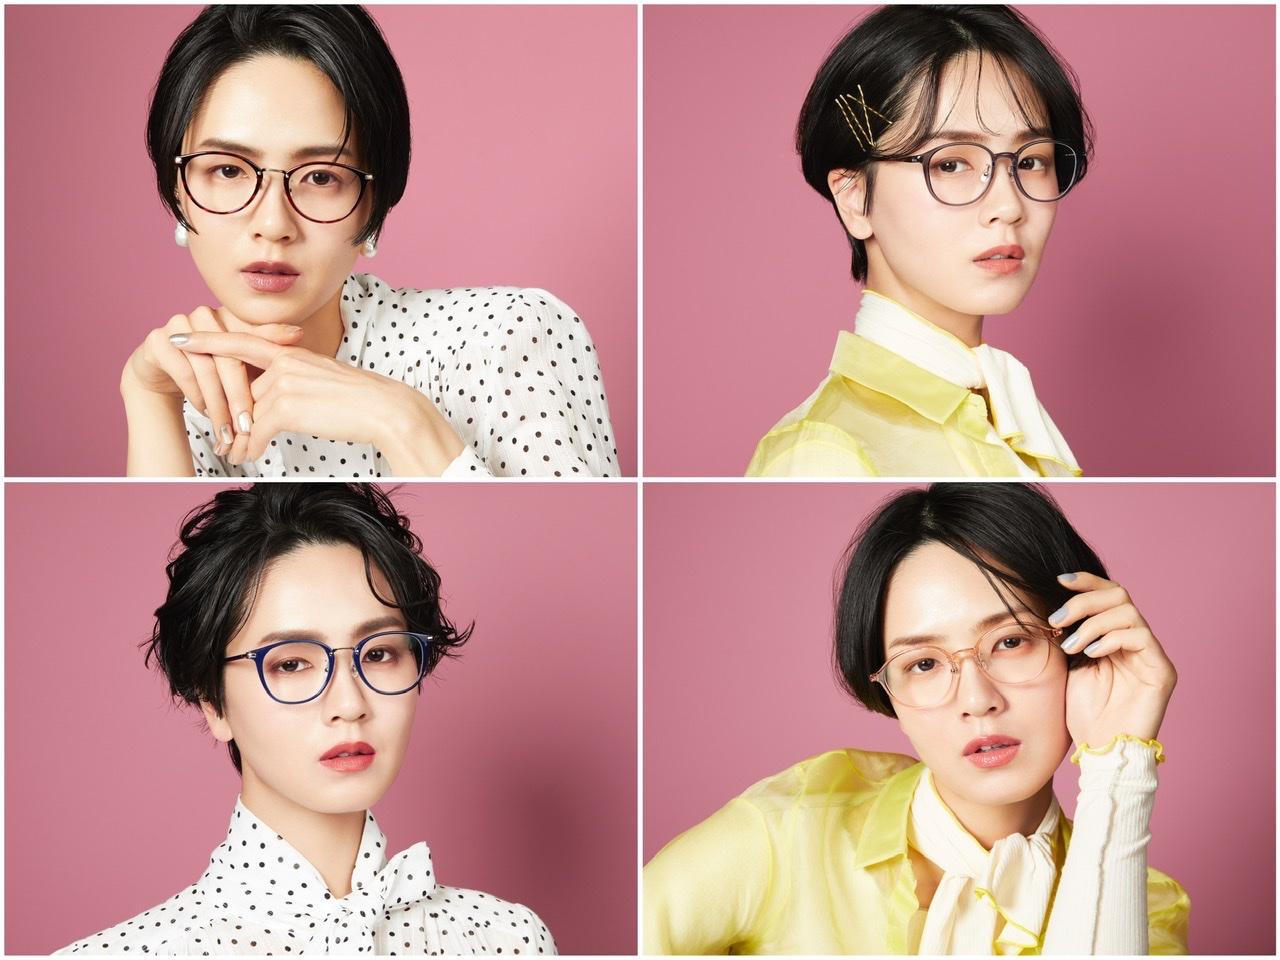 『JINS×イガリシノブ』ついに発売‼︎ 働く女子の理想を叶える「メガネ愛好課」シリーズ全部見せ♡_2